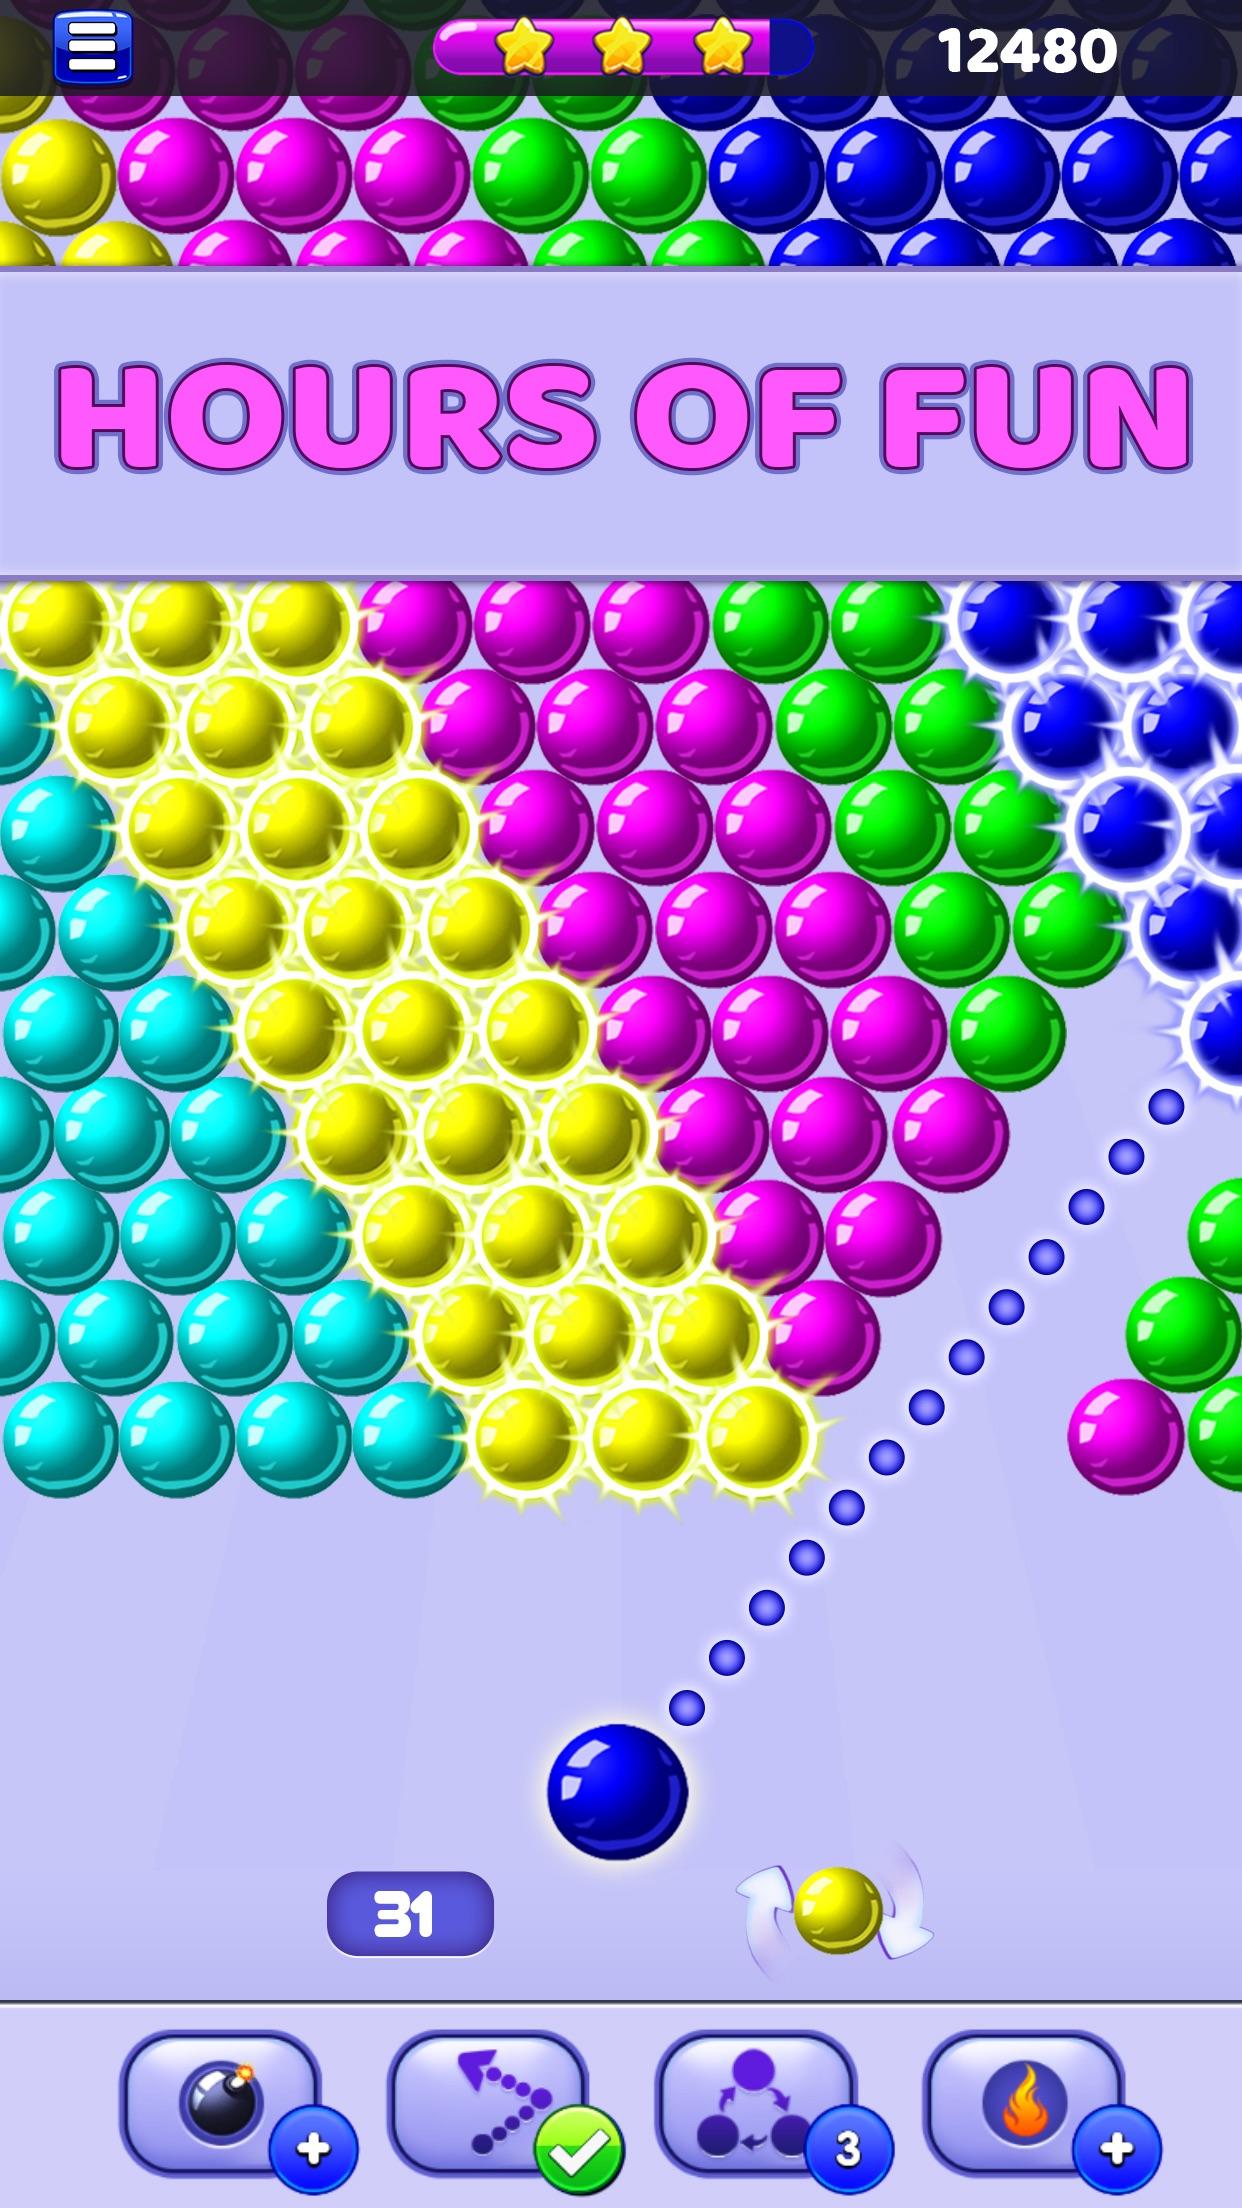 Bubble Shooter - Pop Bubbles Screenshot